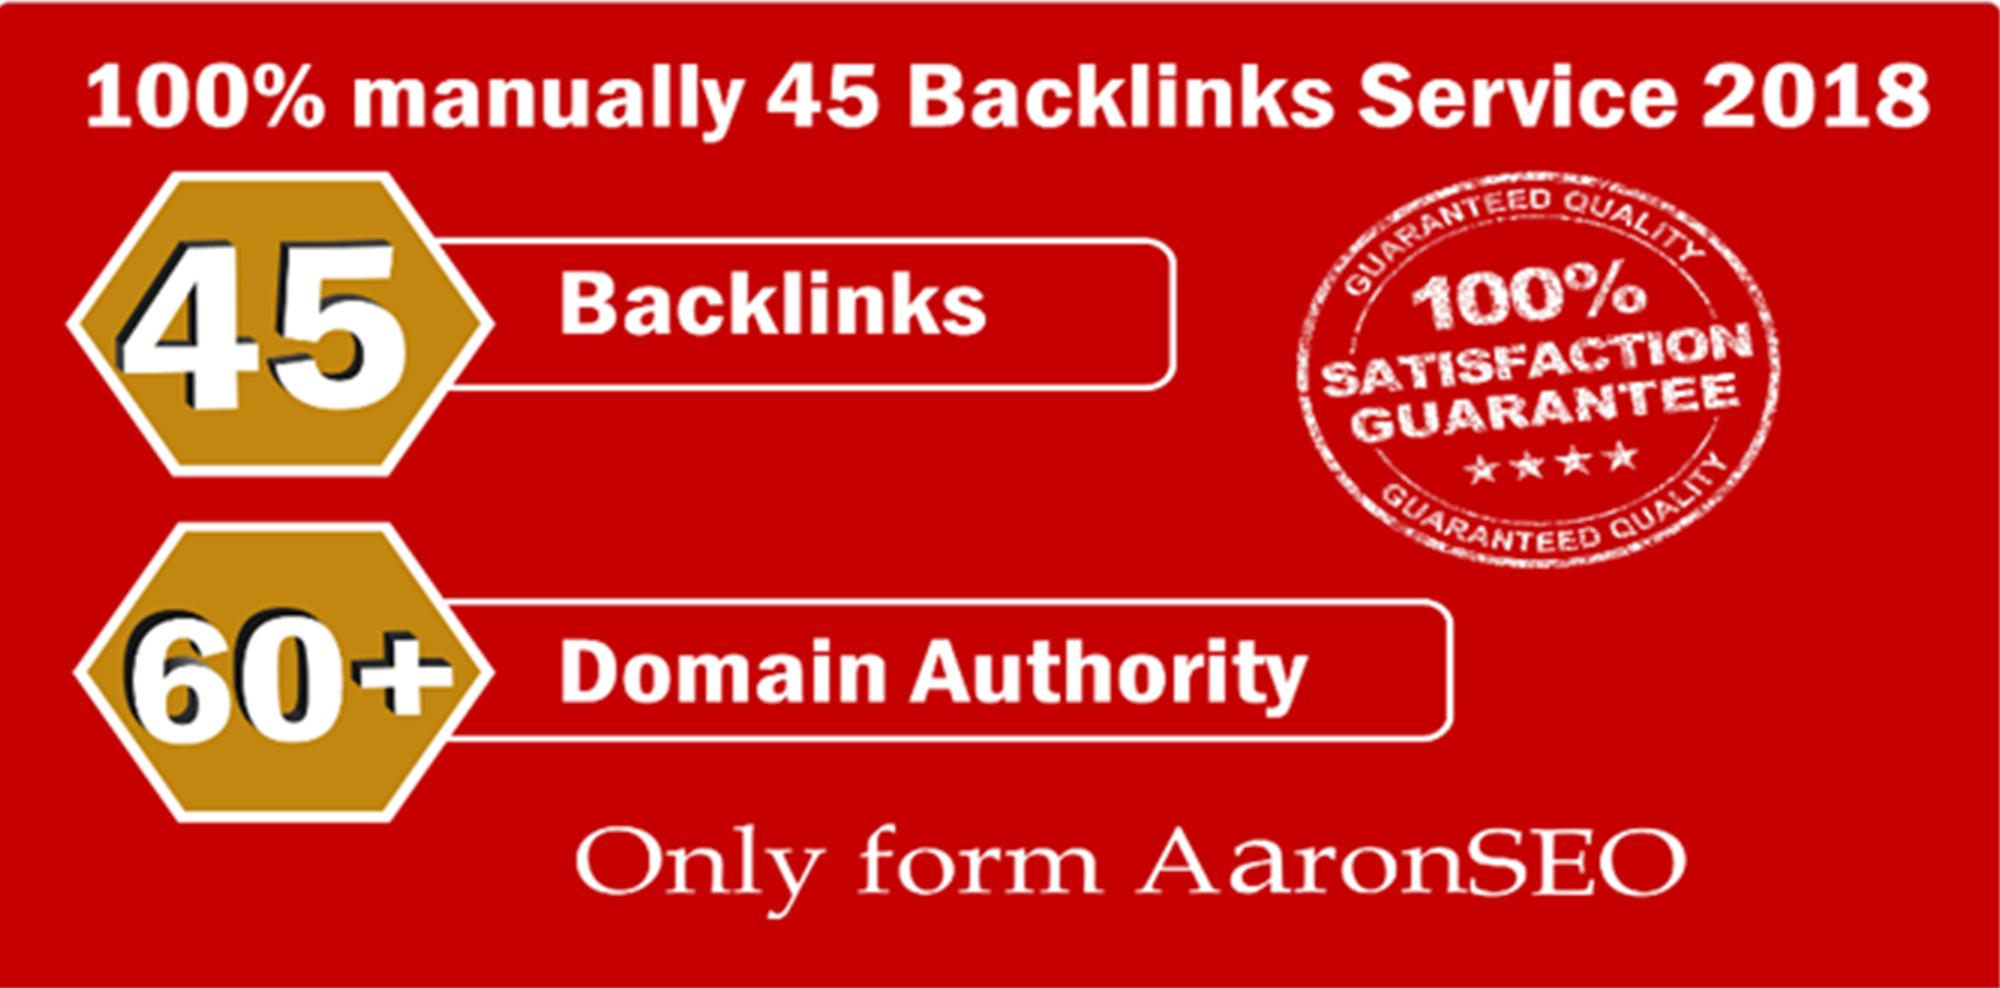 Limited Time Offer - 45 Backlinks from High DA-60+ Domains-Skyrocket your Google RANKING